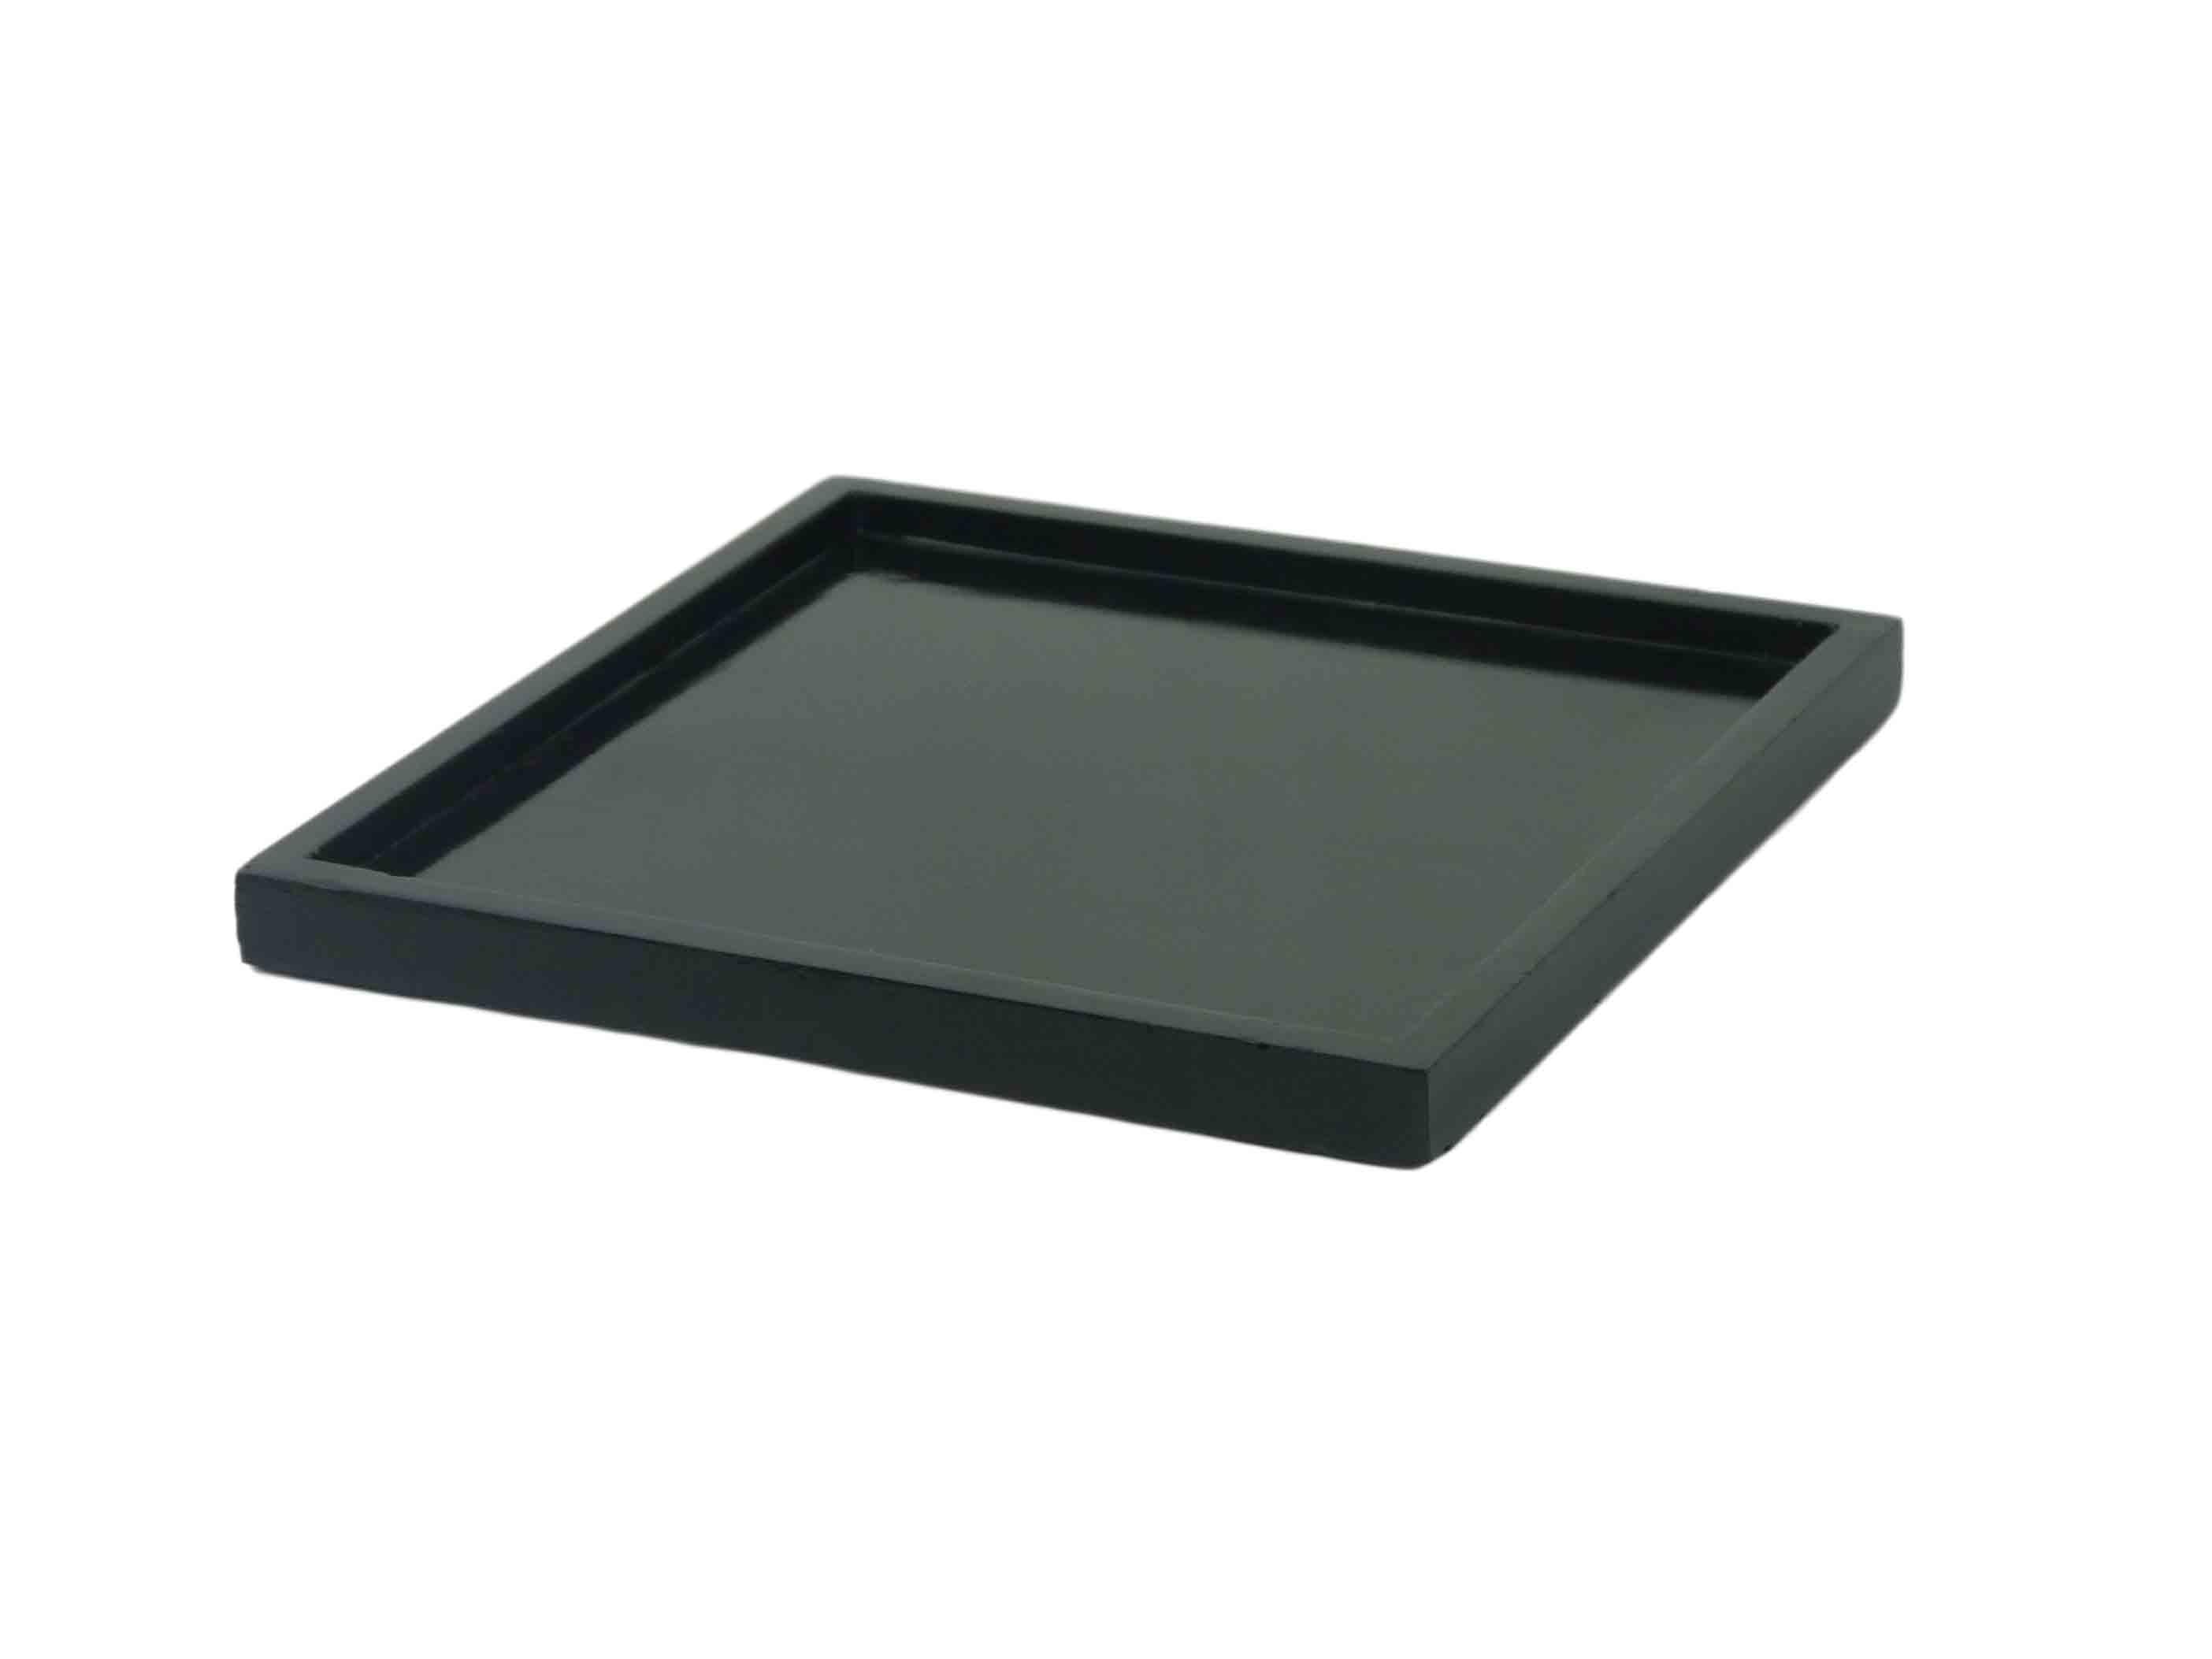 Holztablett schwarz 25x25 cm tablett kerzentablett dekotablett deko shabby - Deko tablett schwarz ...